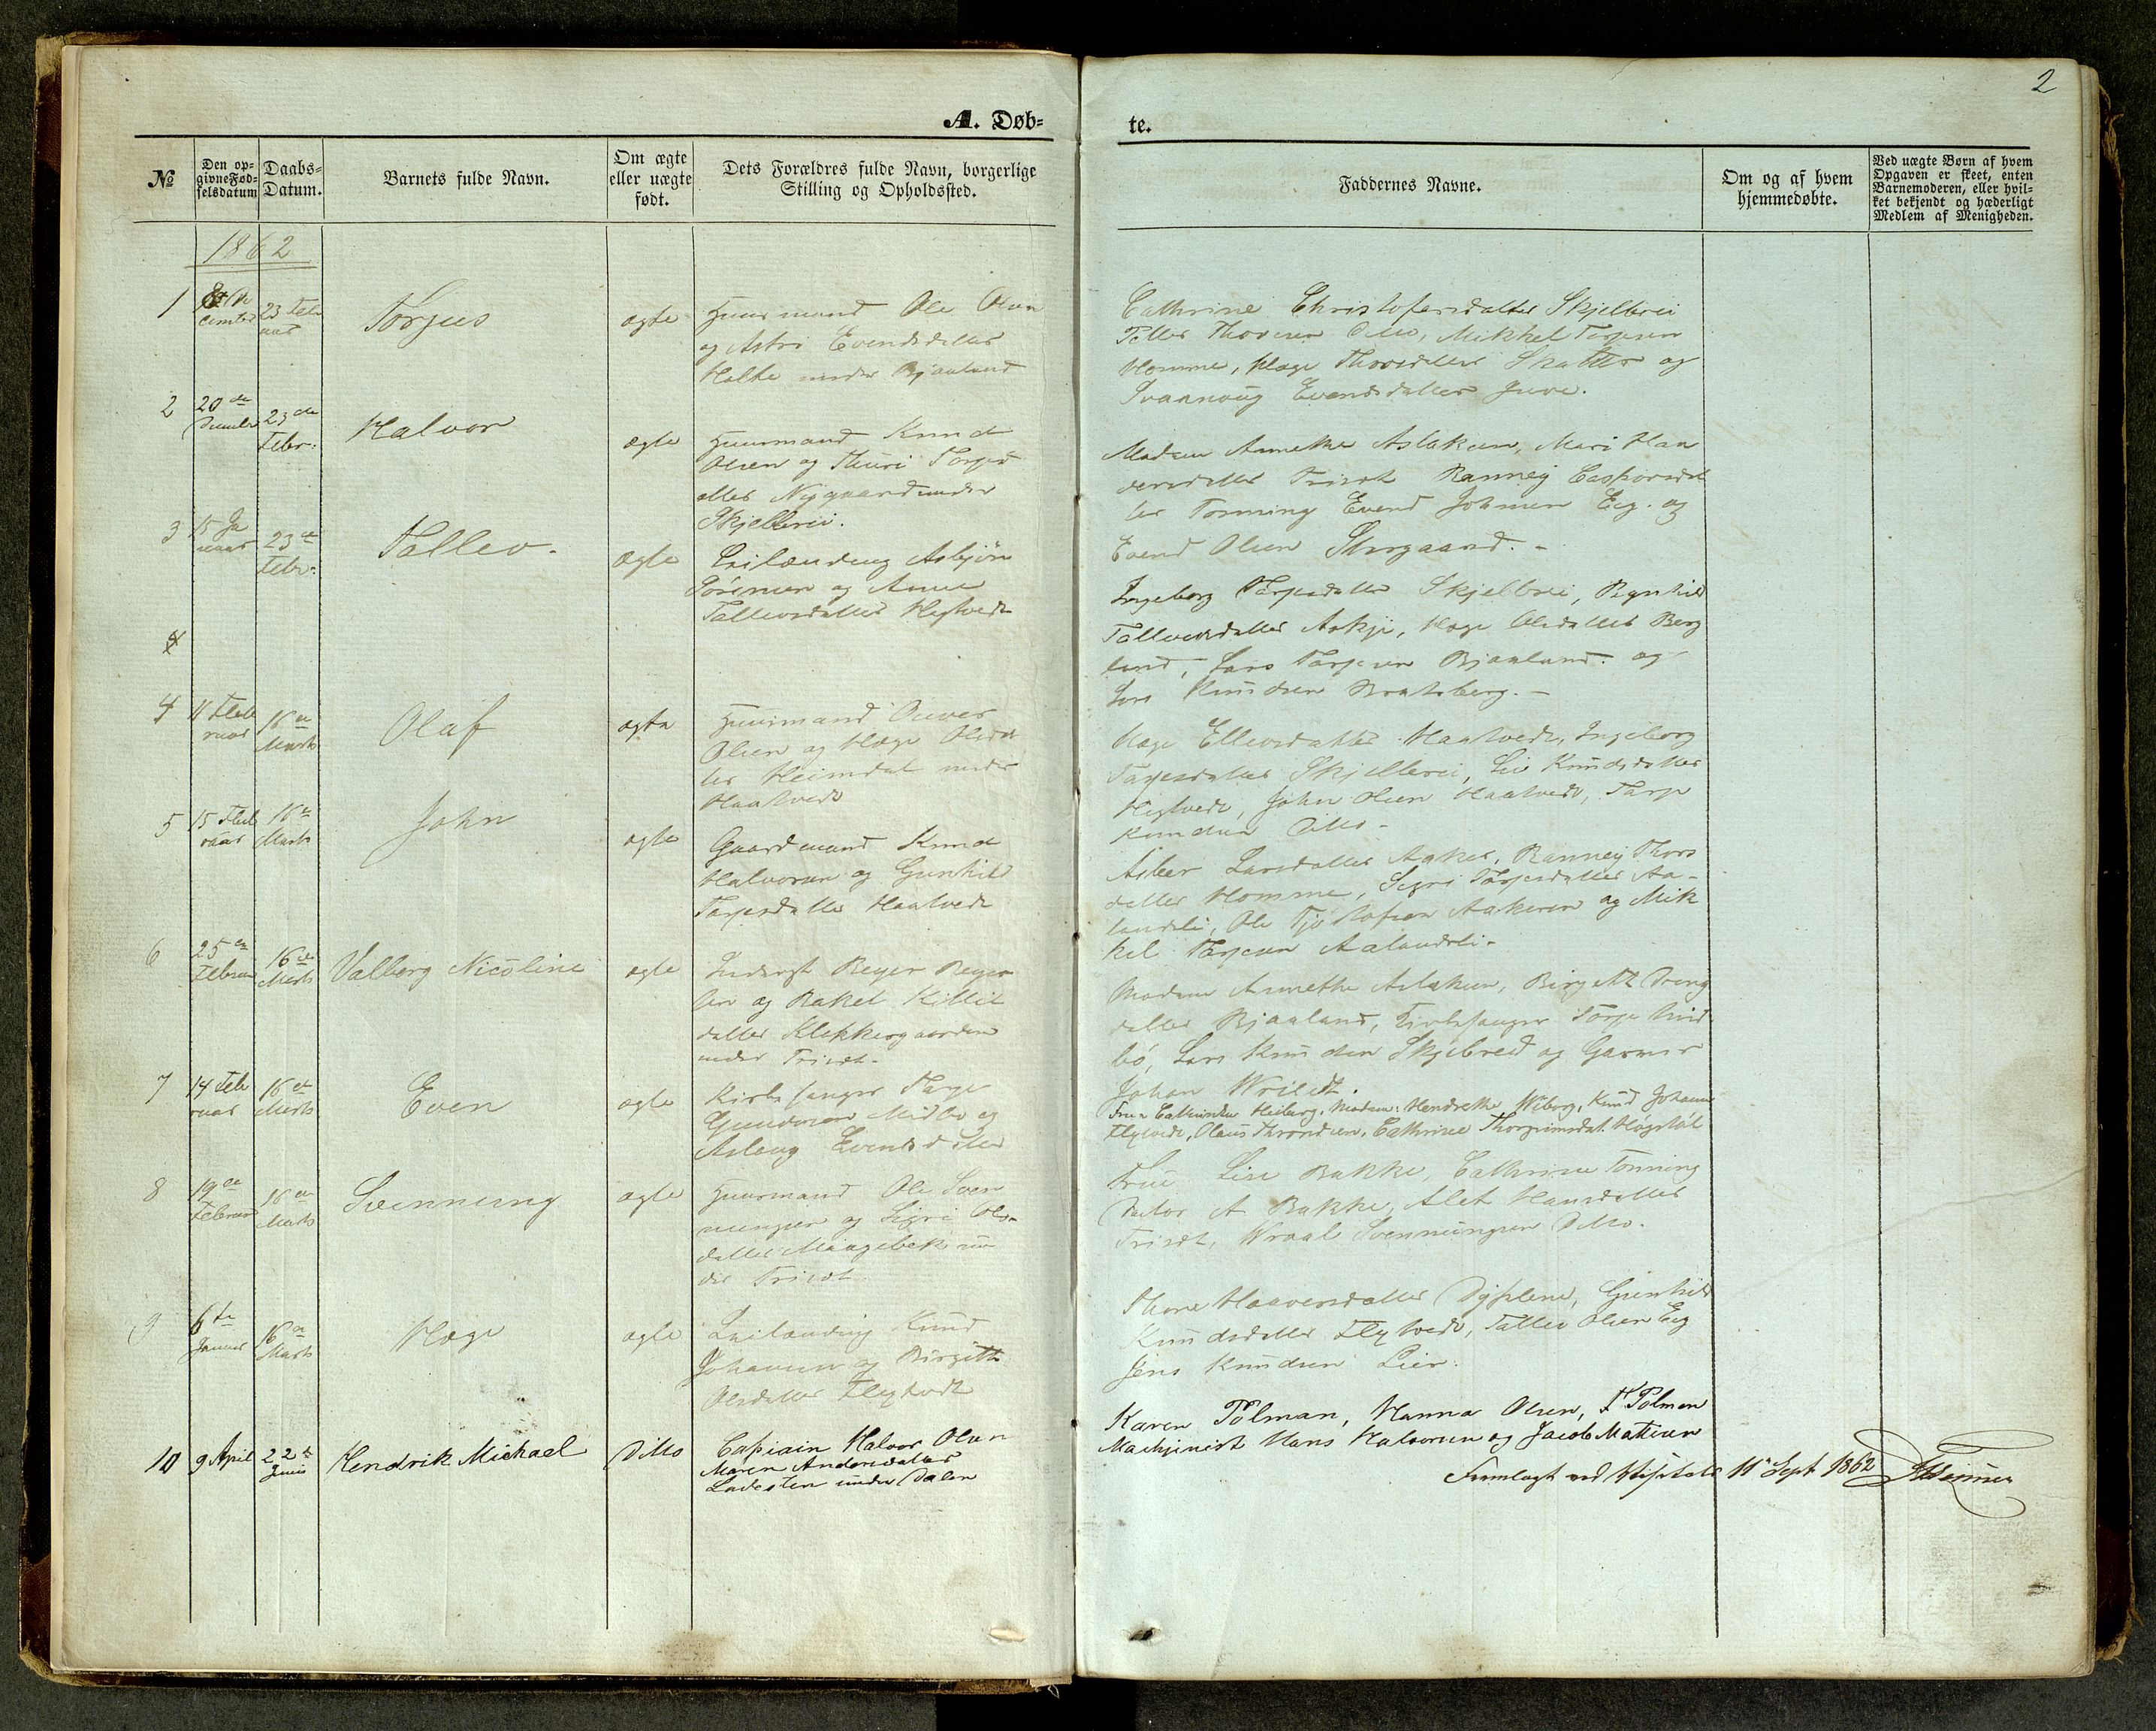 SAKO, Lårdal kirkebøker, G/Ga/L0002: Klokkerbok nr. I 2, 1861-1890, s. 2